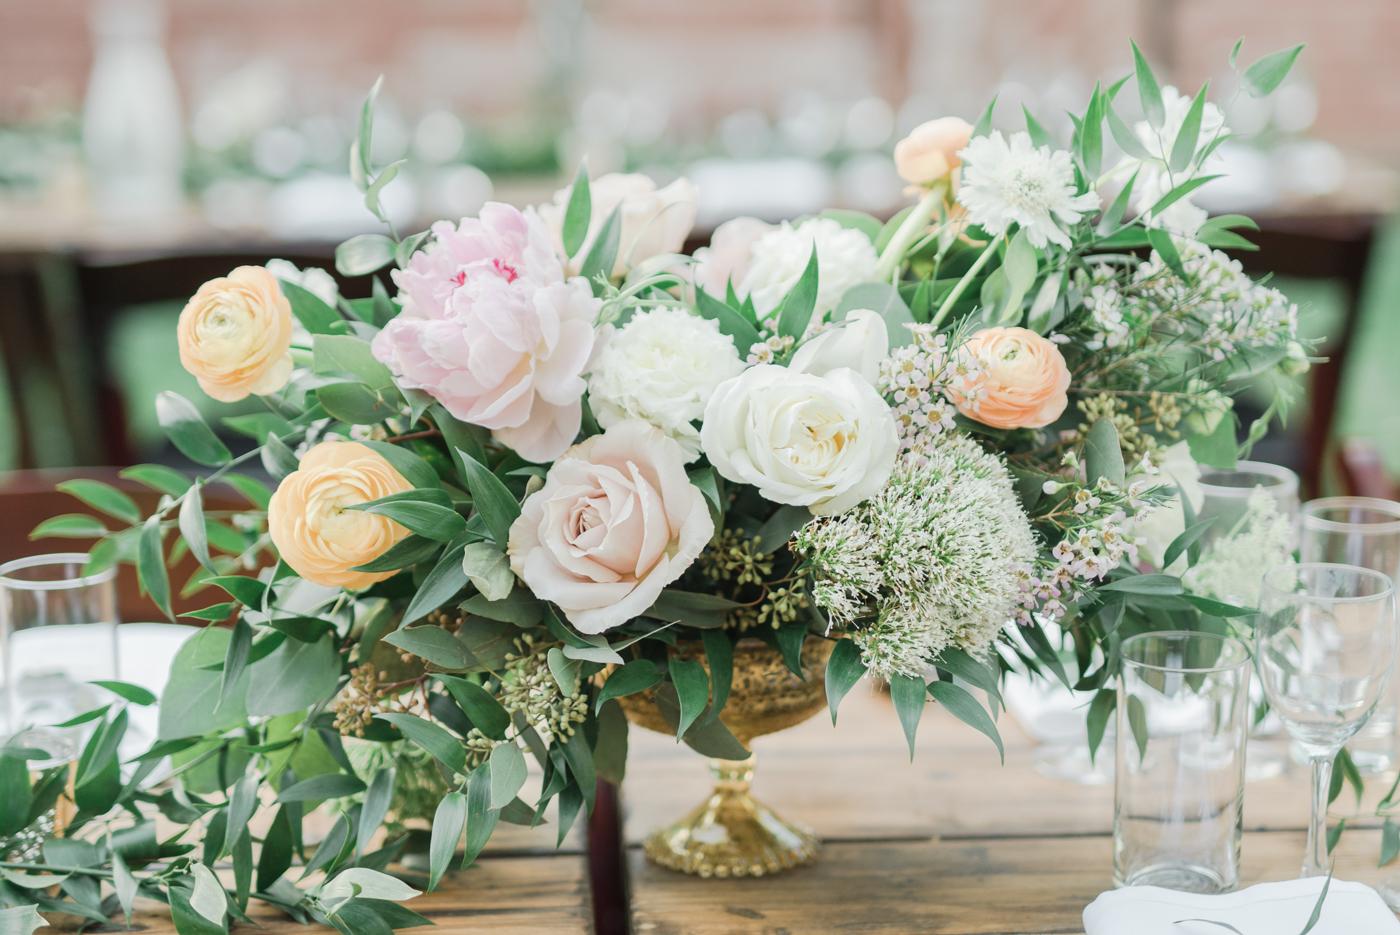 l&c-the_1909_spring_garden_wedding_los_angeles_fine_art_wedding_photographer-35.jpg